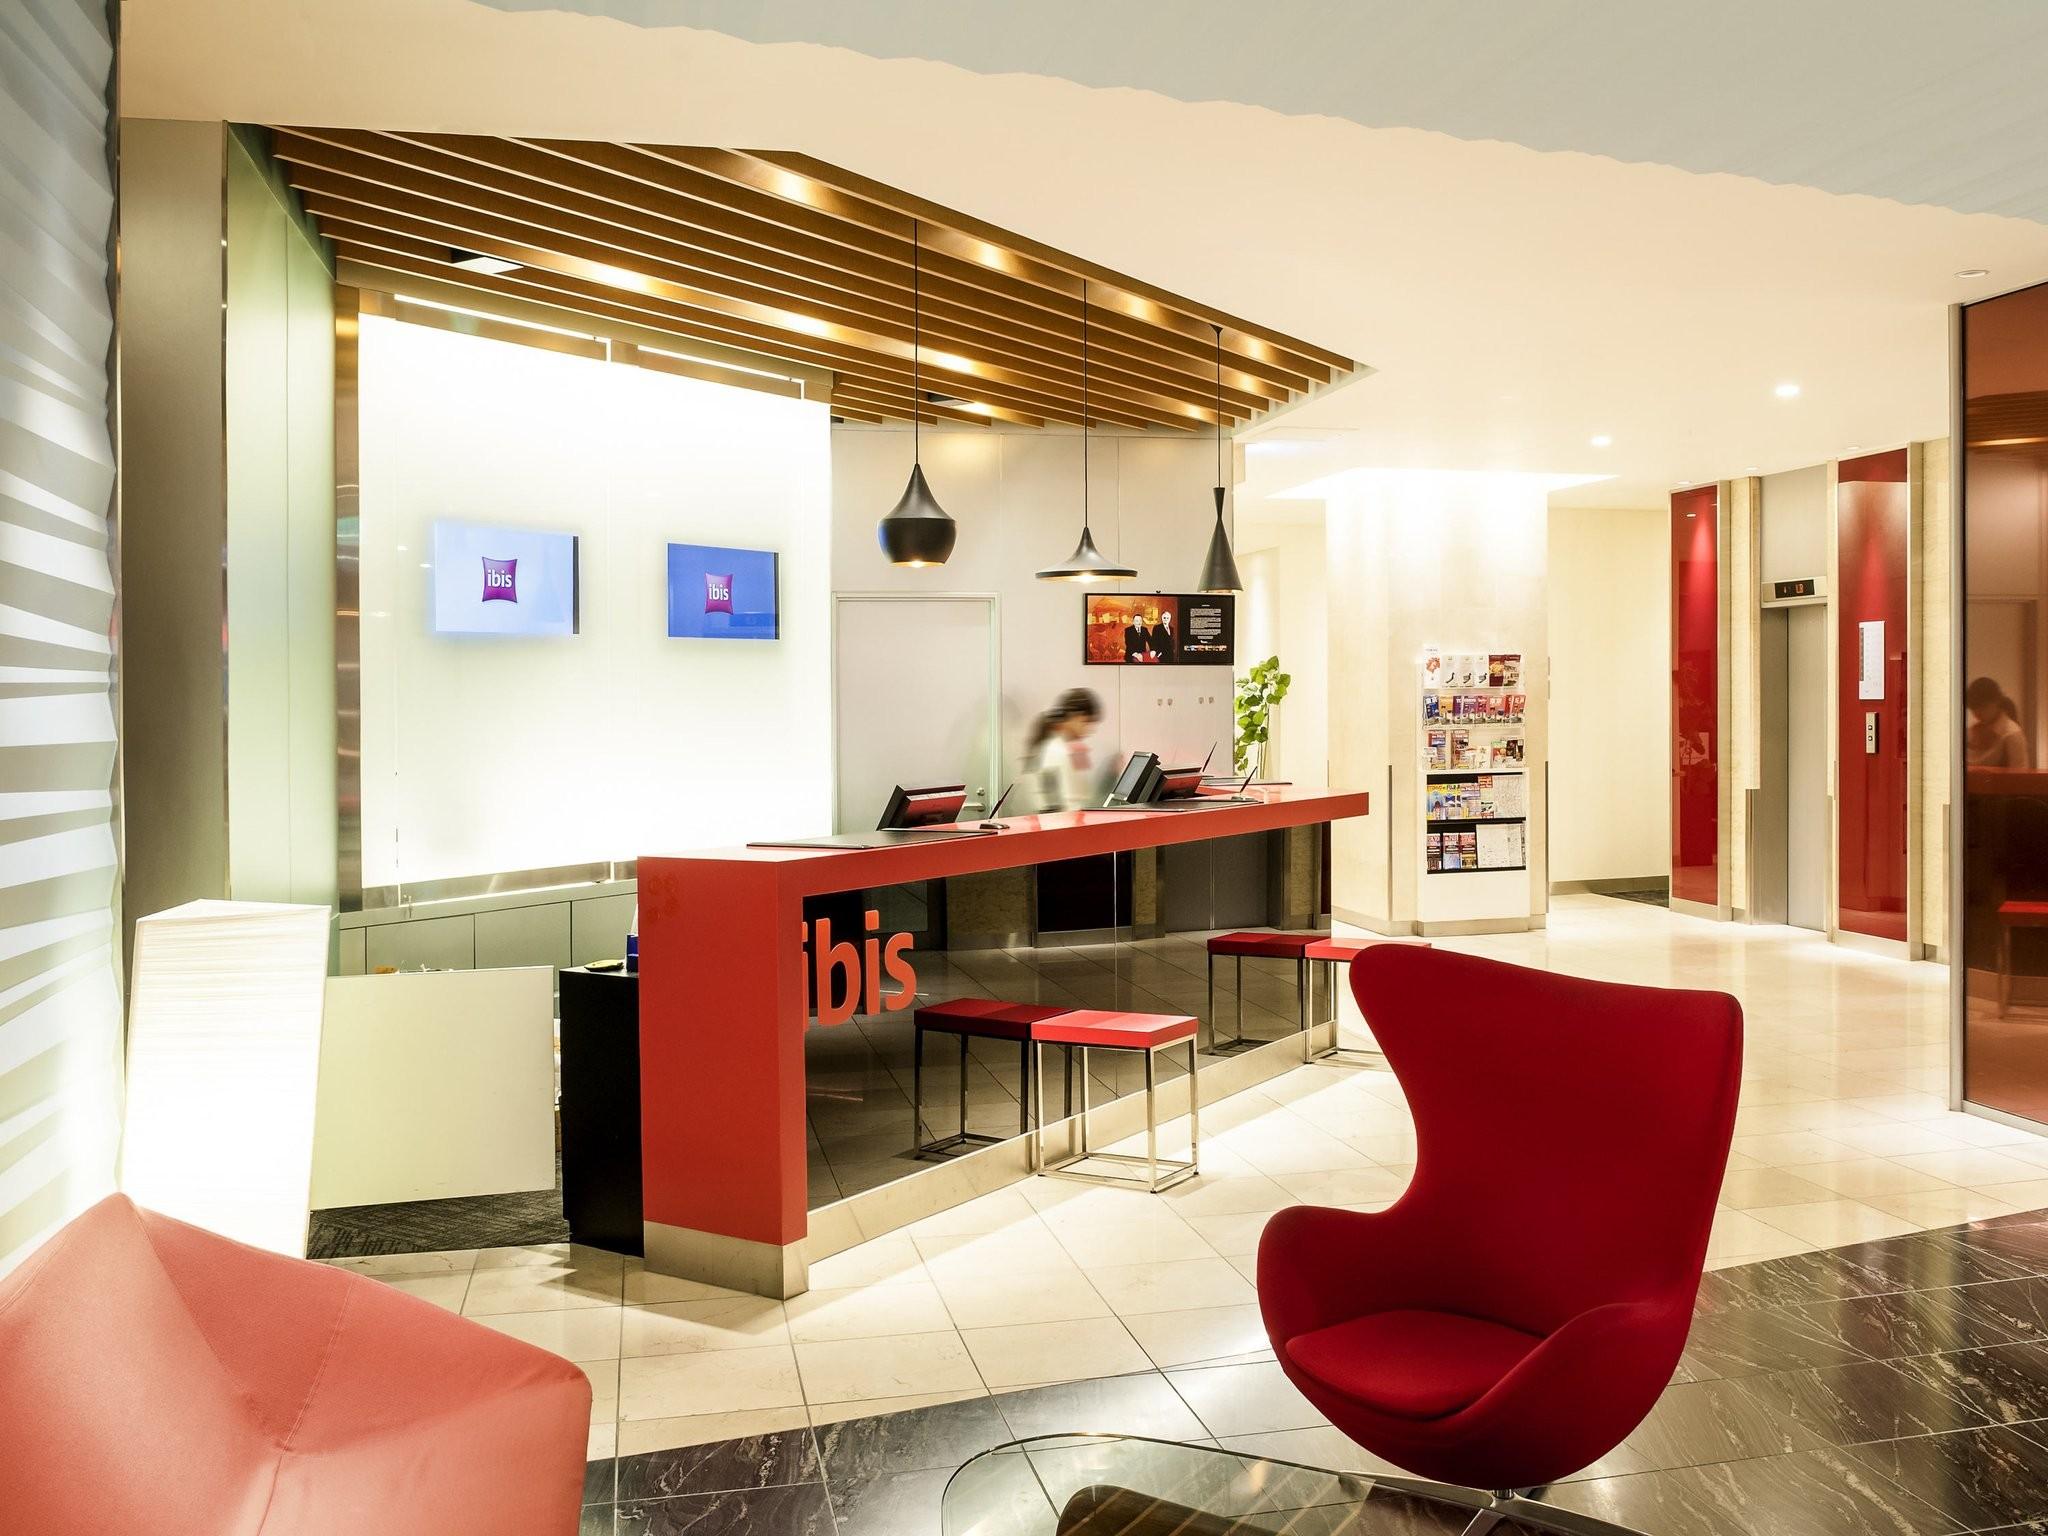 Shinjuku tokyo Japan Hotels Lovely Ibis Hotel tokyo tourist Class tokyo Japan Hotels Gds Reservation